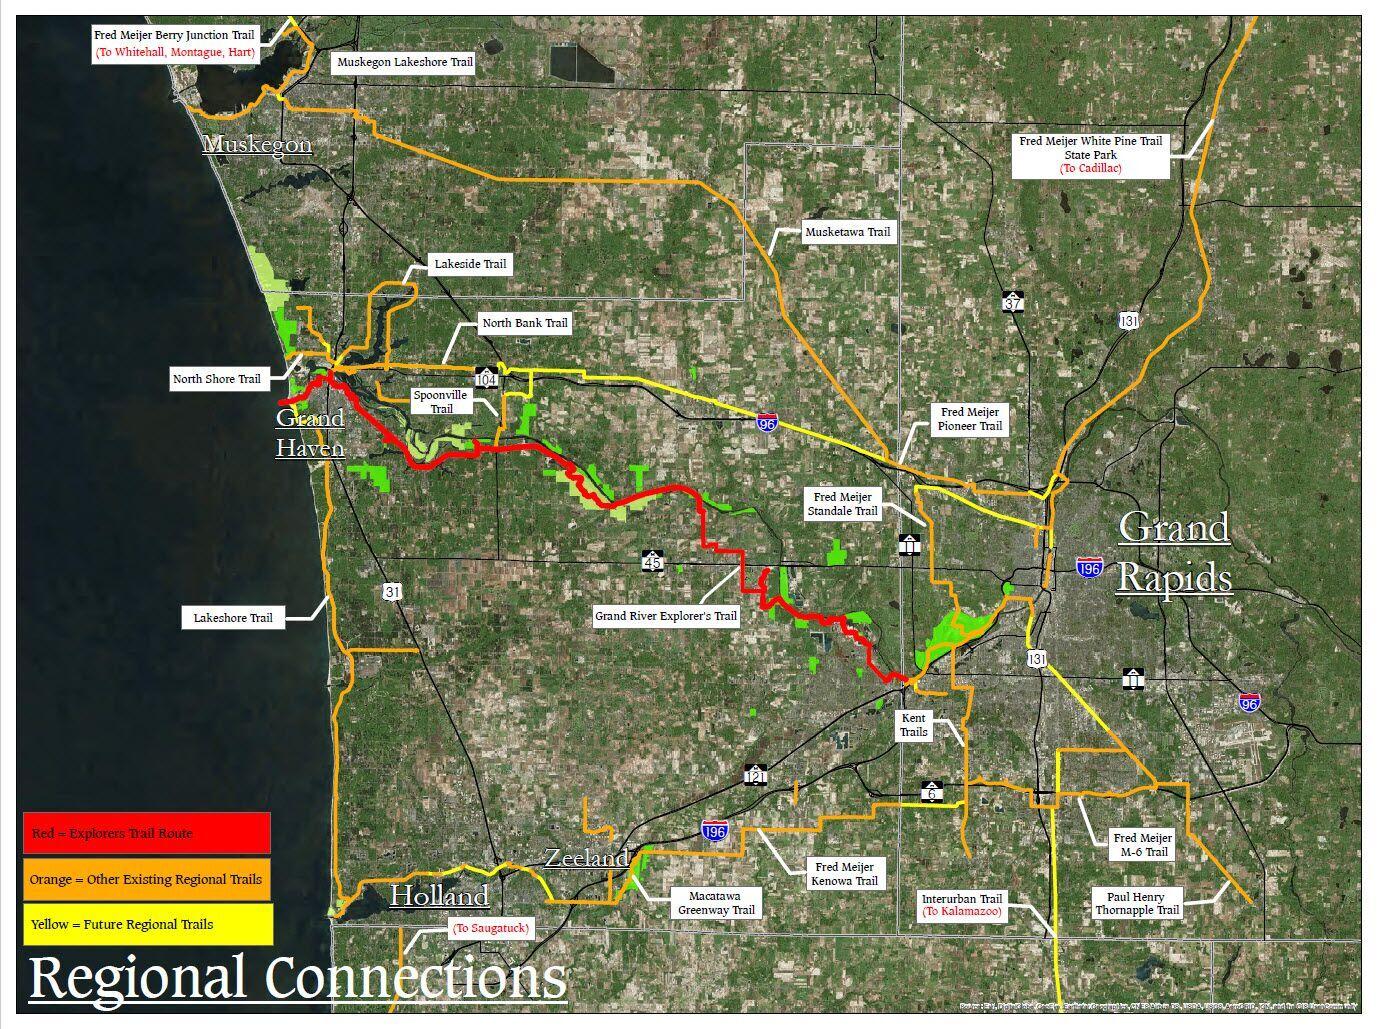 Gvsu Grand Rapids Campus Map.Greenway Park Projects Ottawa County Michigan